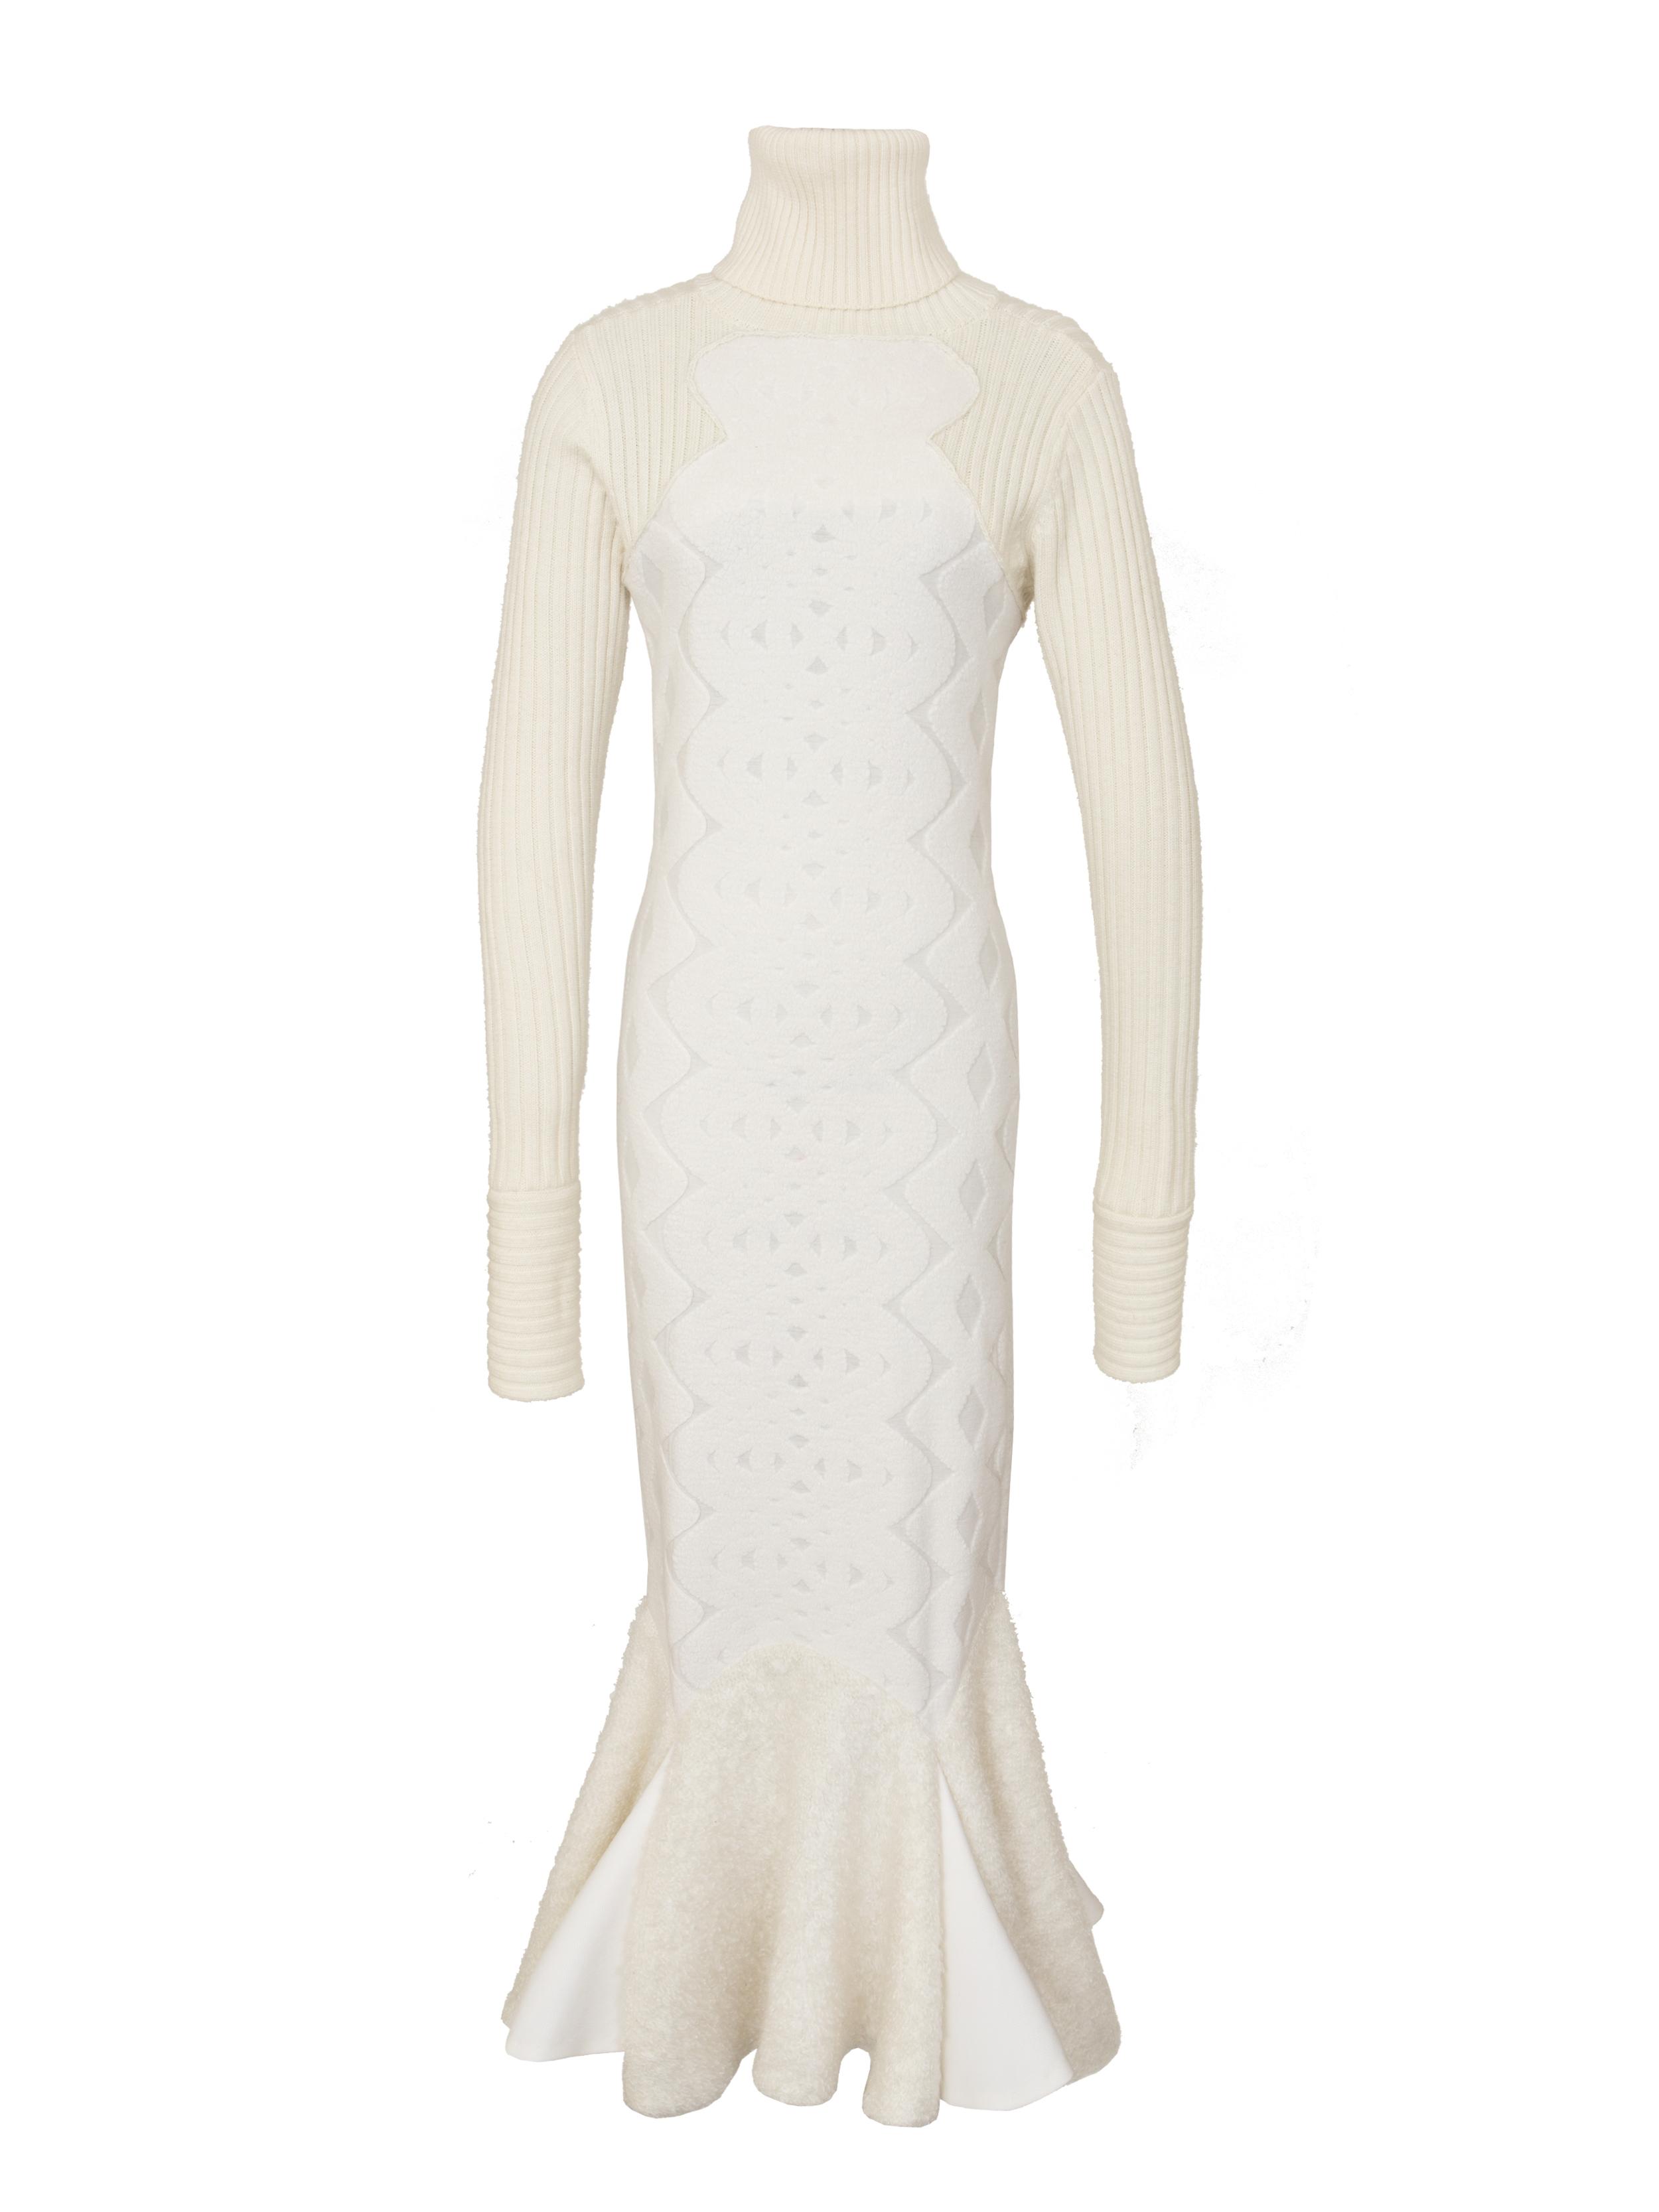 P1183-R, L:S Turtleneck Flare Dress, Ivory.jpg